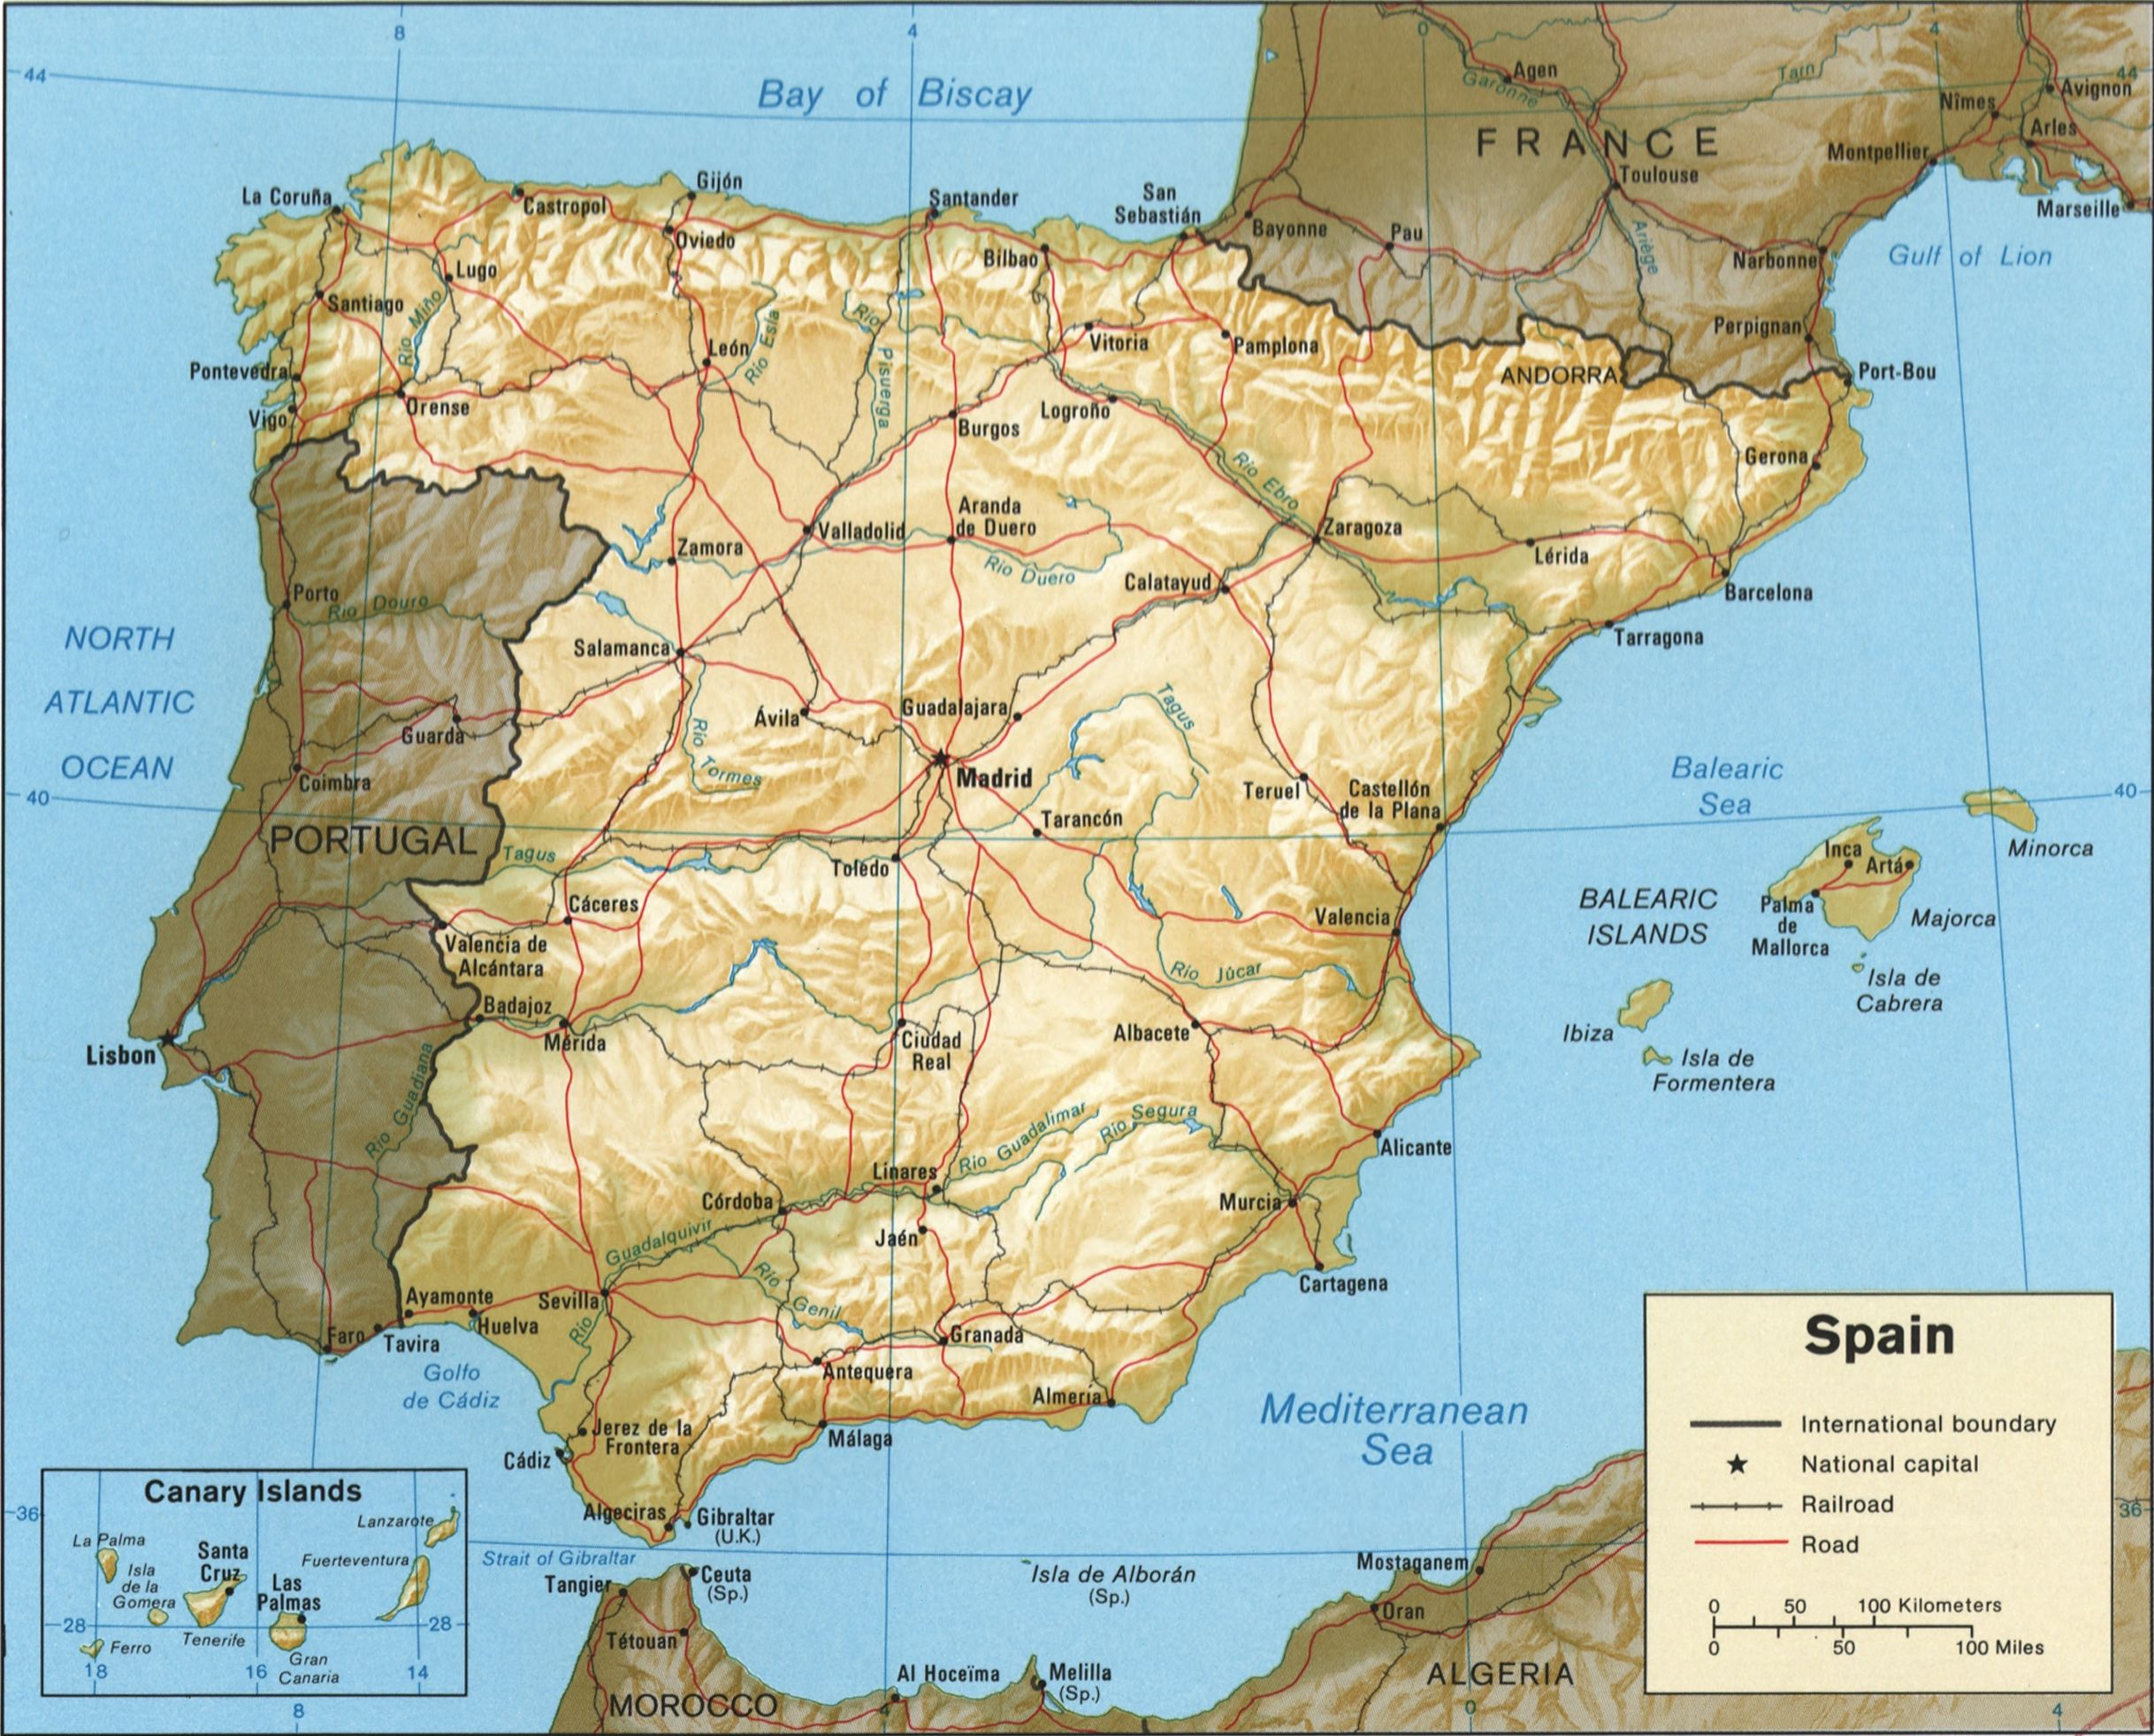 Map Of Spain History Map Of Spain Spain Pinterest - Map of spain